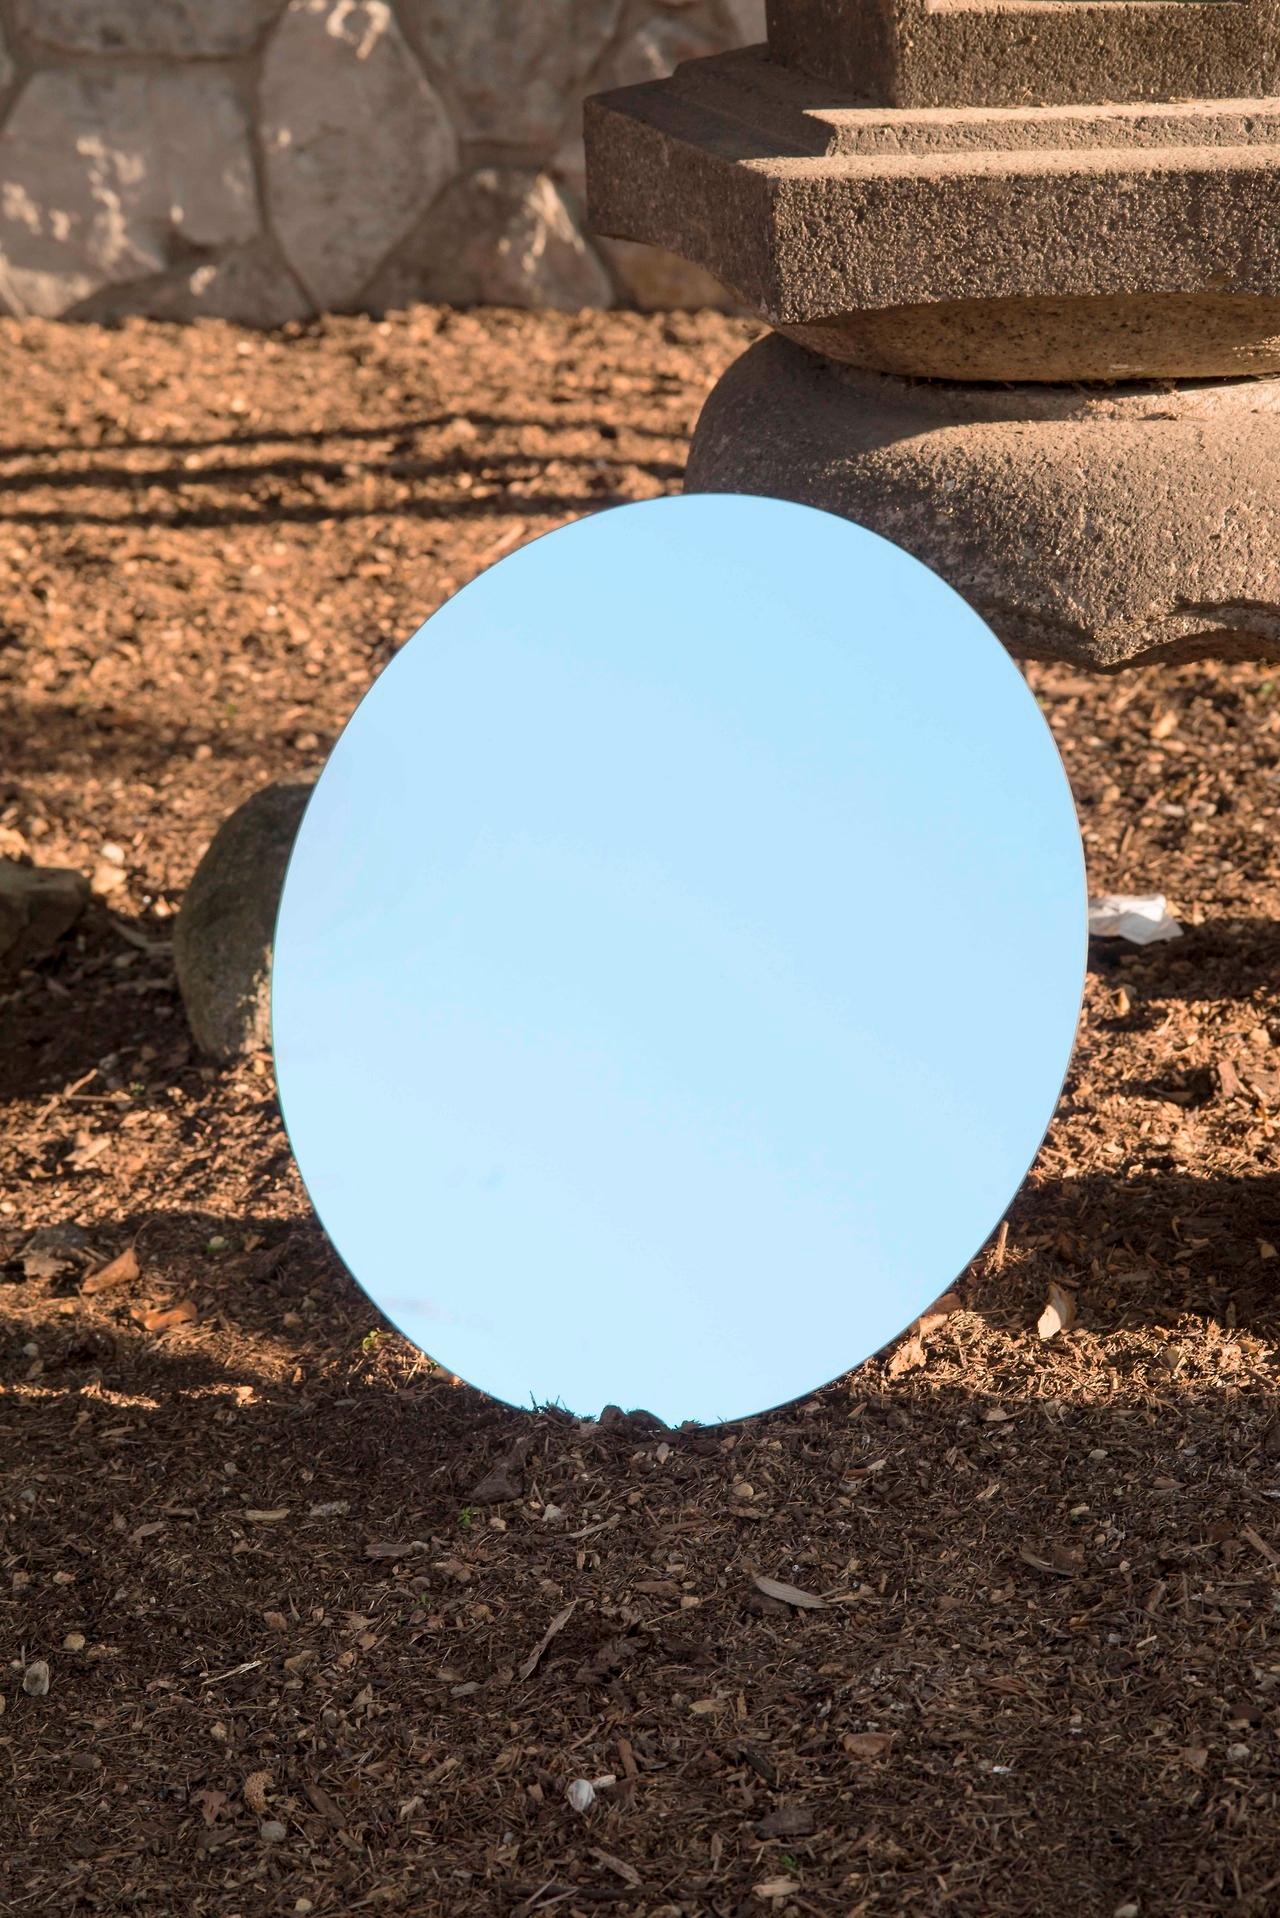 RIMASÙU View mirror set, Ensad  - modernism_is_crap | ello